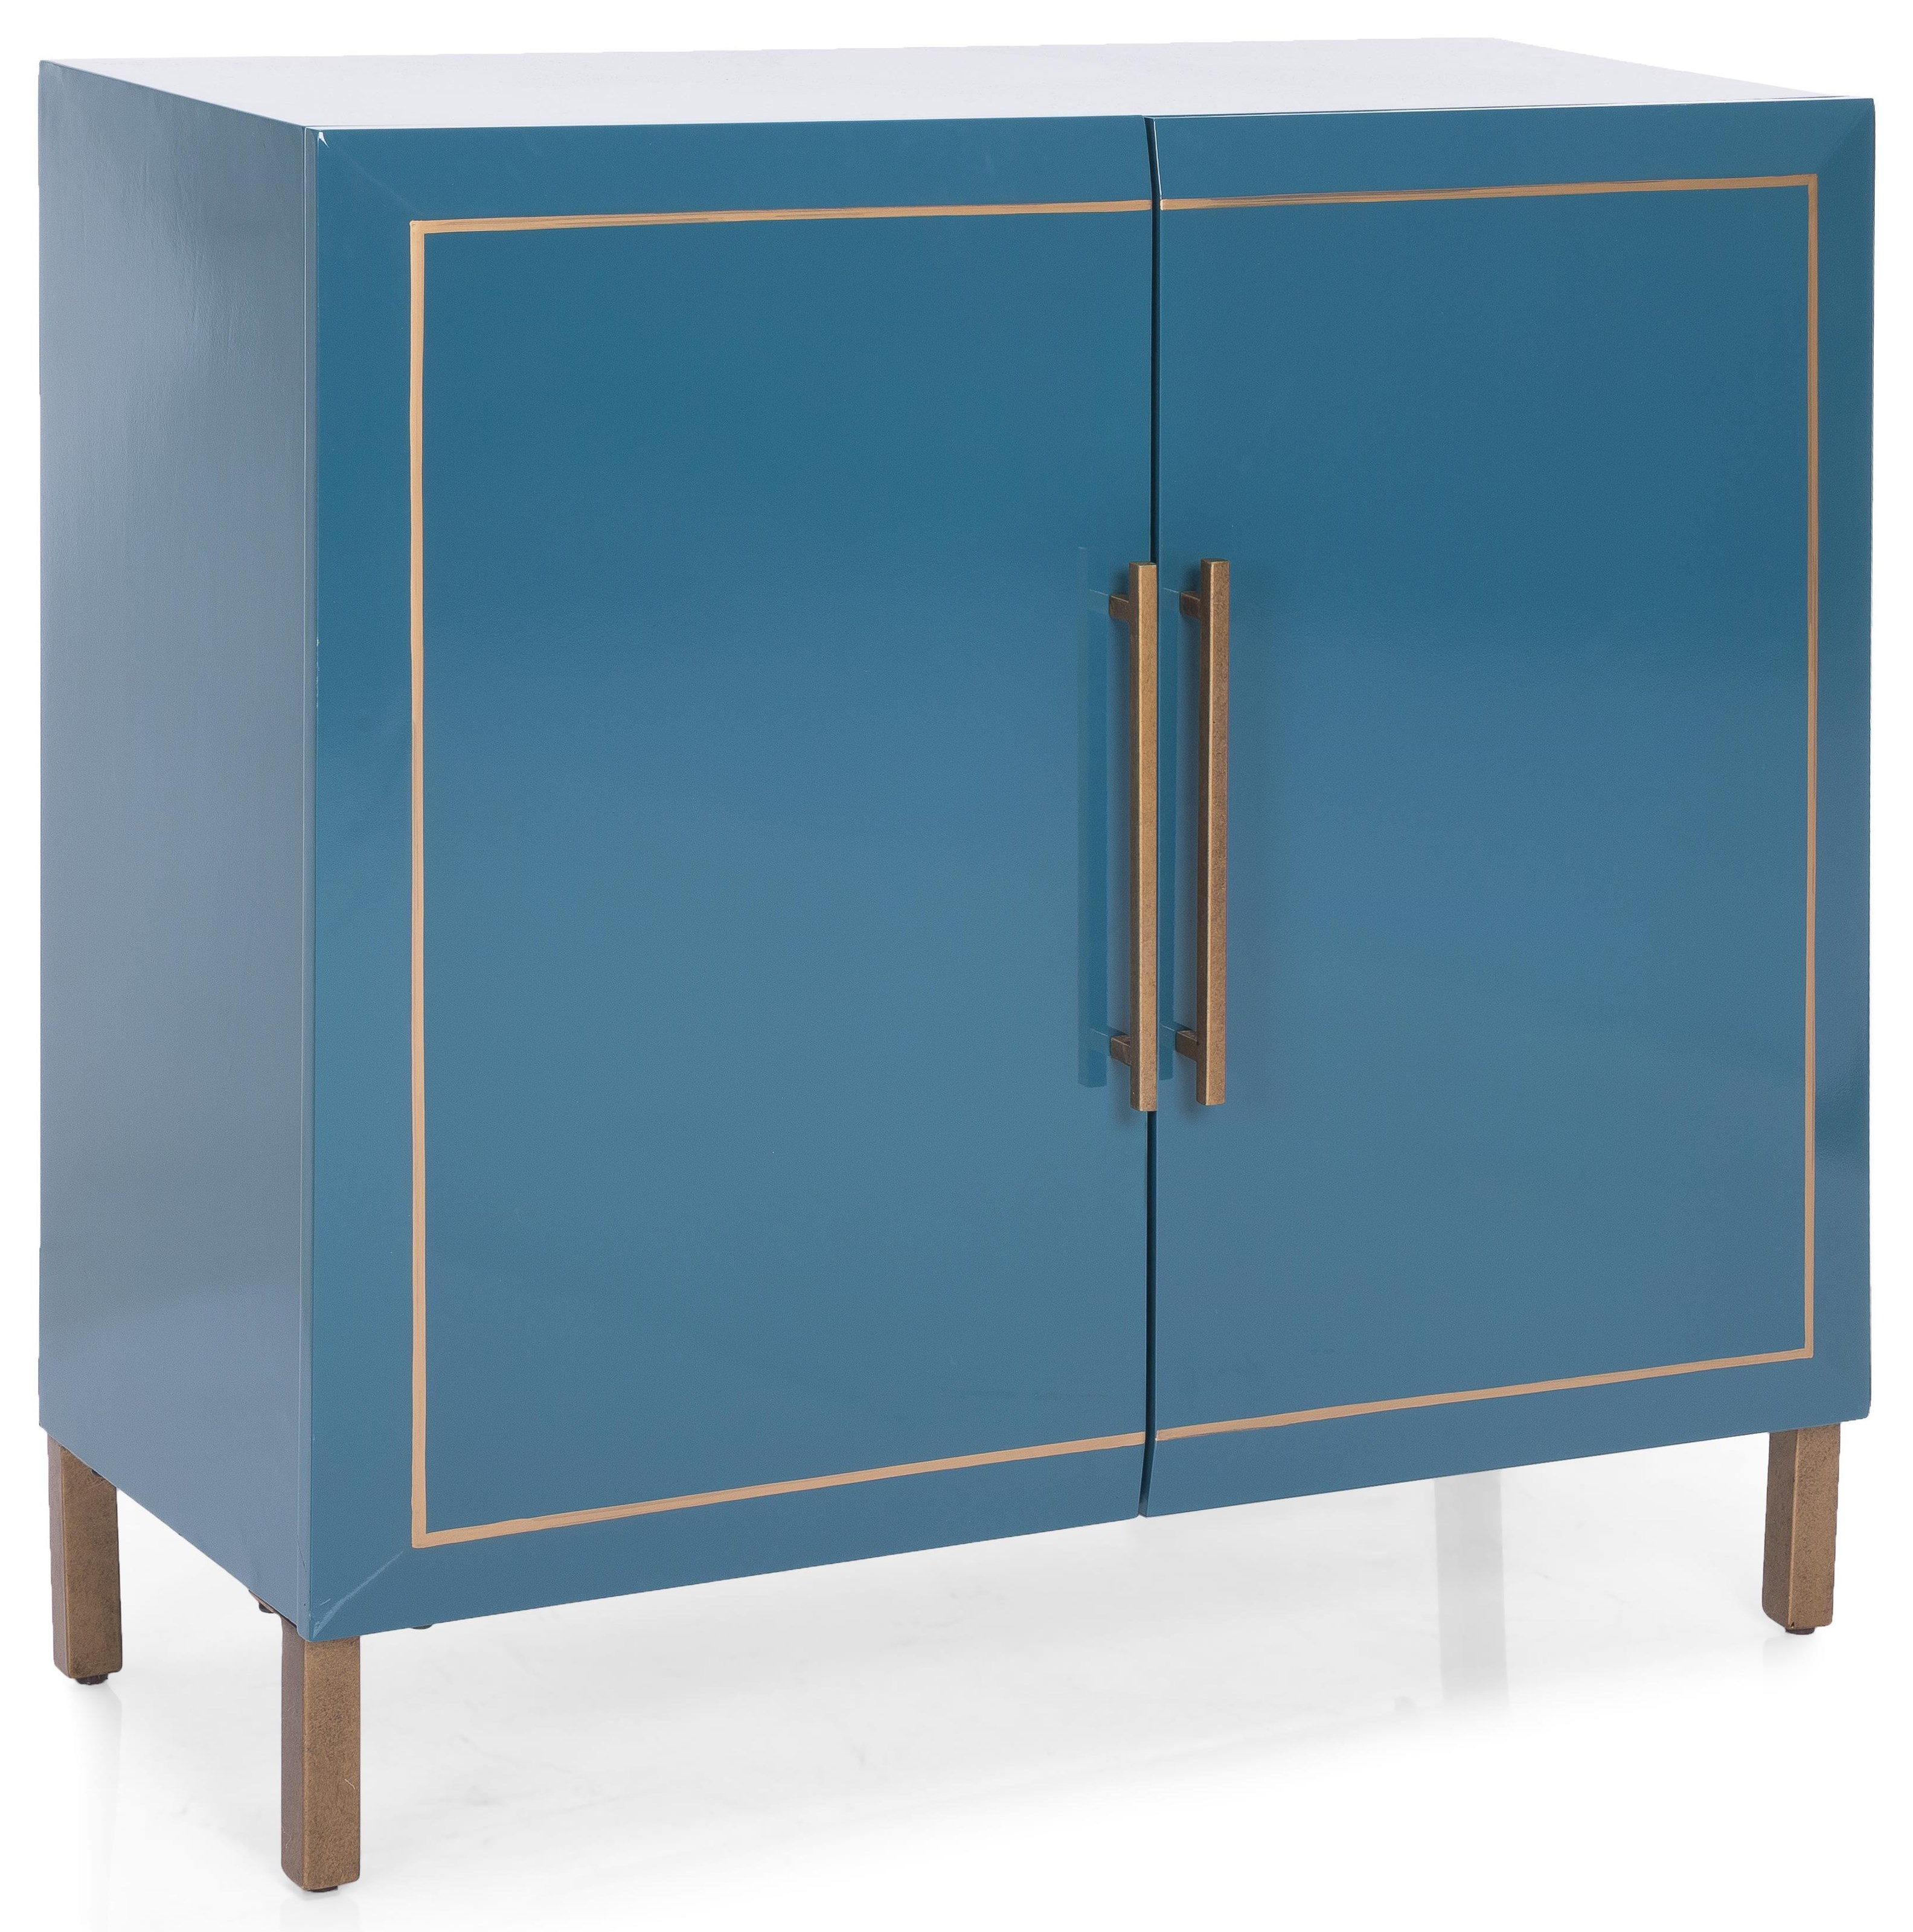 Carlotta Cabinet by Decor-Rest at Stoney Creek Furniture